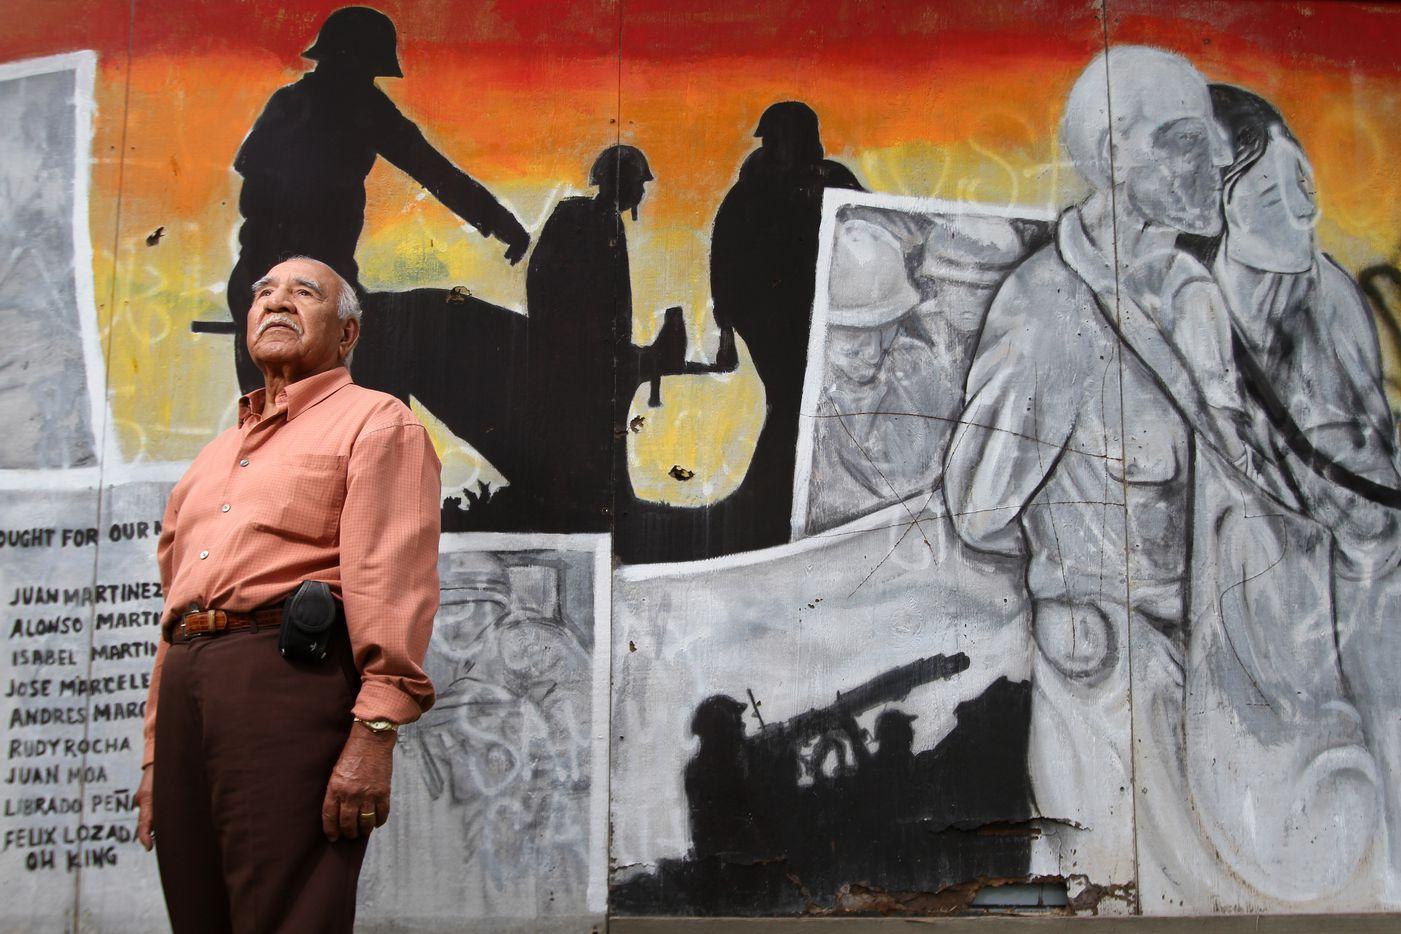 Felix Lozada, 89, a war veteran of World War II, near a mural that bears his name along with other war veterans, on Nov. 7, 2011 in West Dallas.